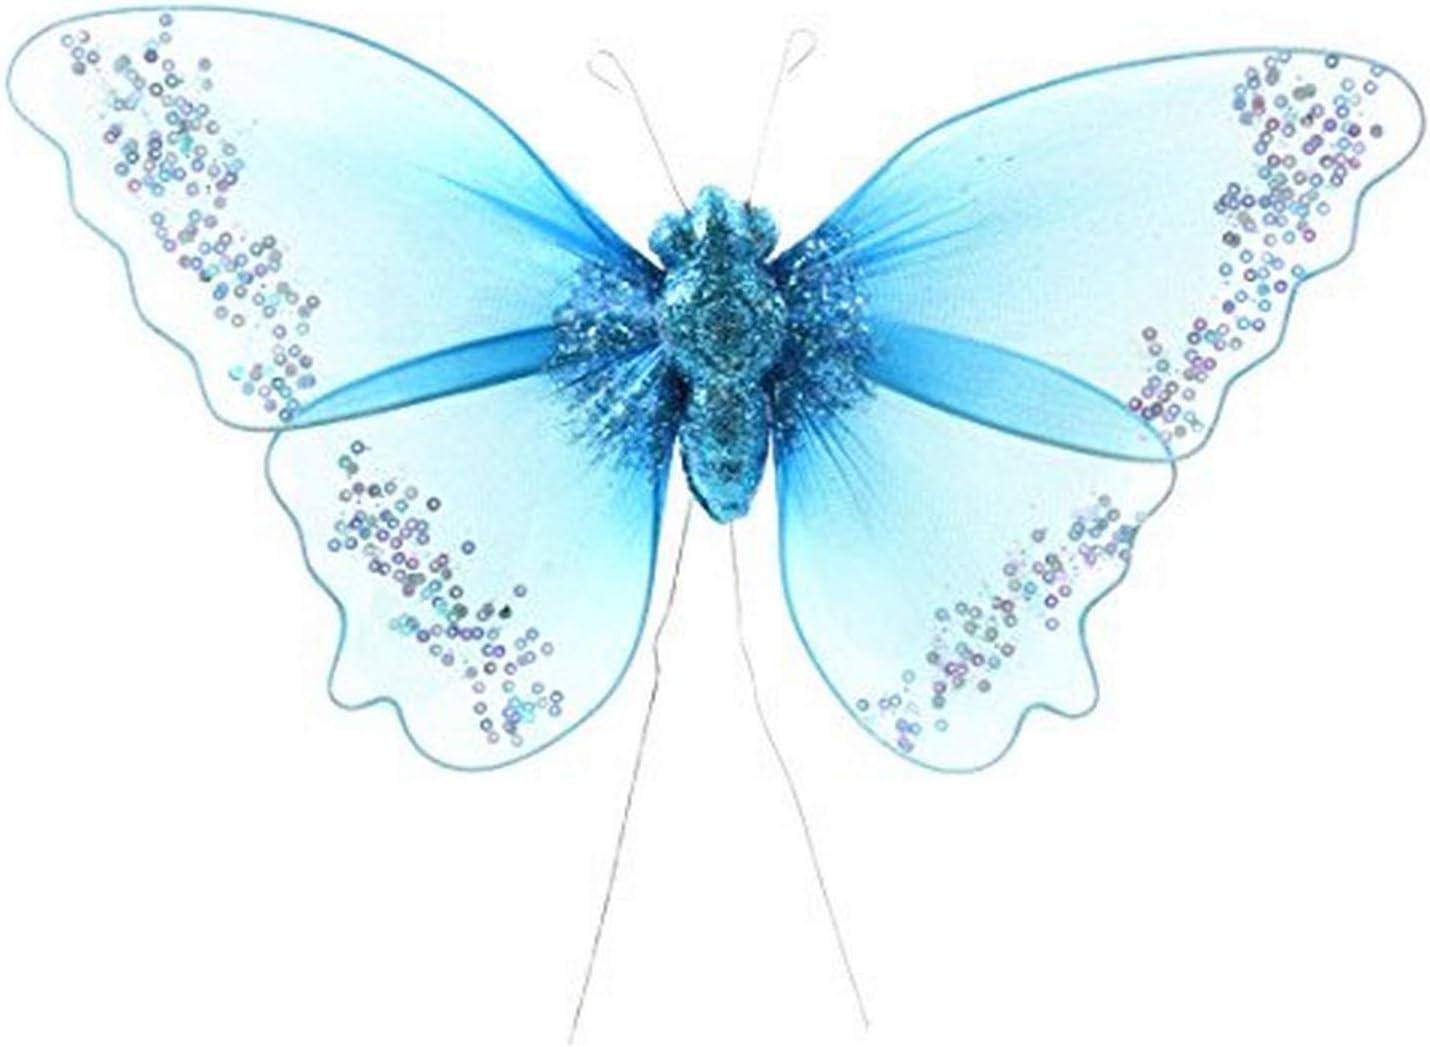 Shinoda Design Center 0165500231 2 Piece Unique Butterfly Decor Set, 10